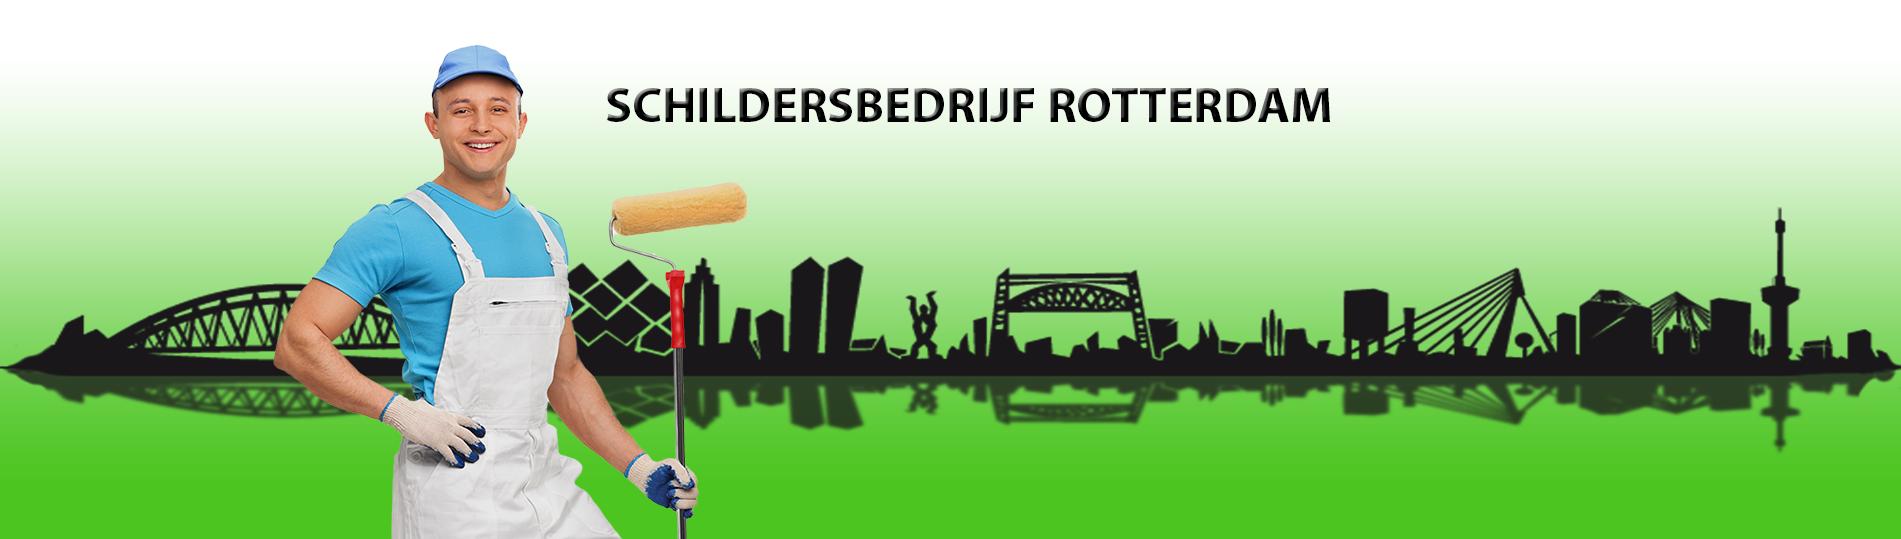 SCHILDERSBEDRIJF-ROTTERDAM-slider